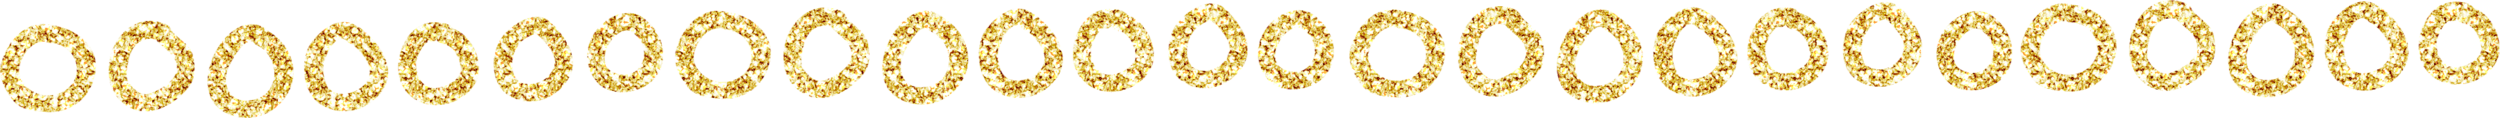 goldglitterborder03.png